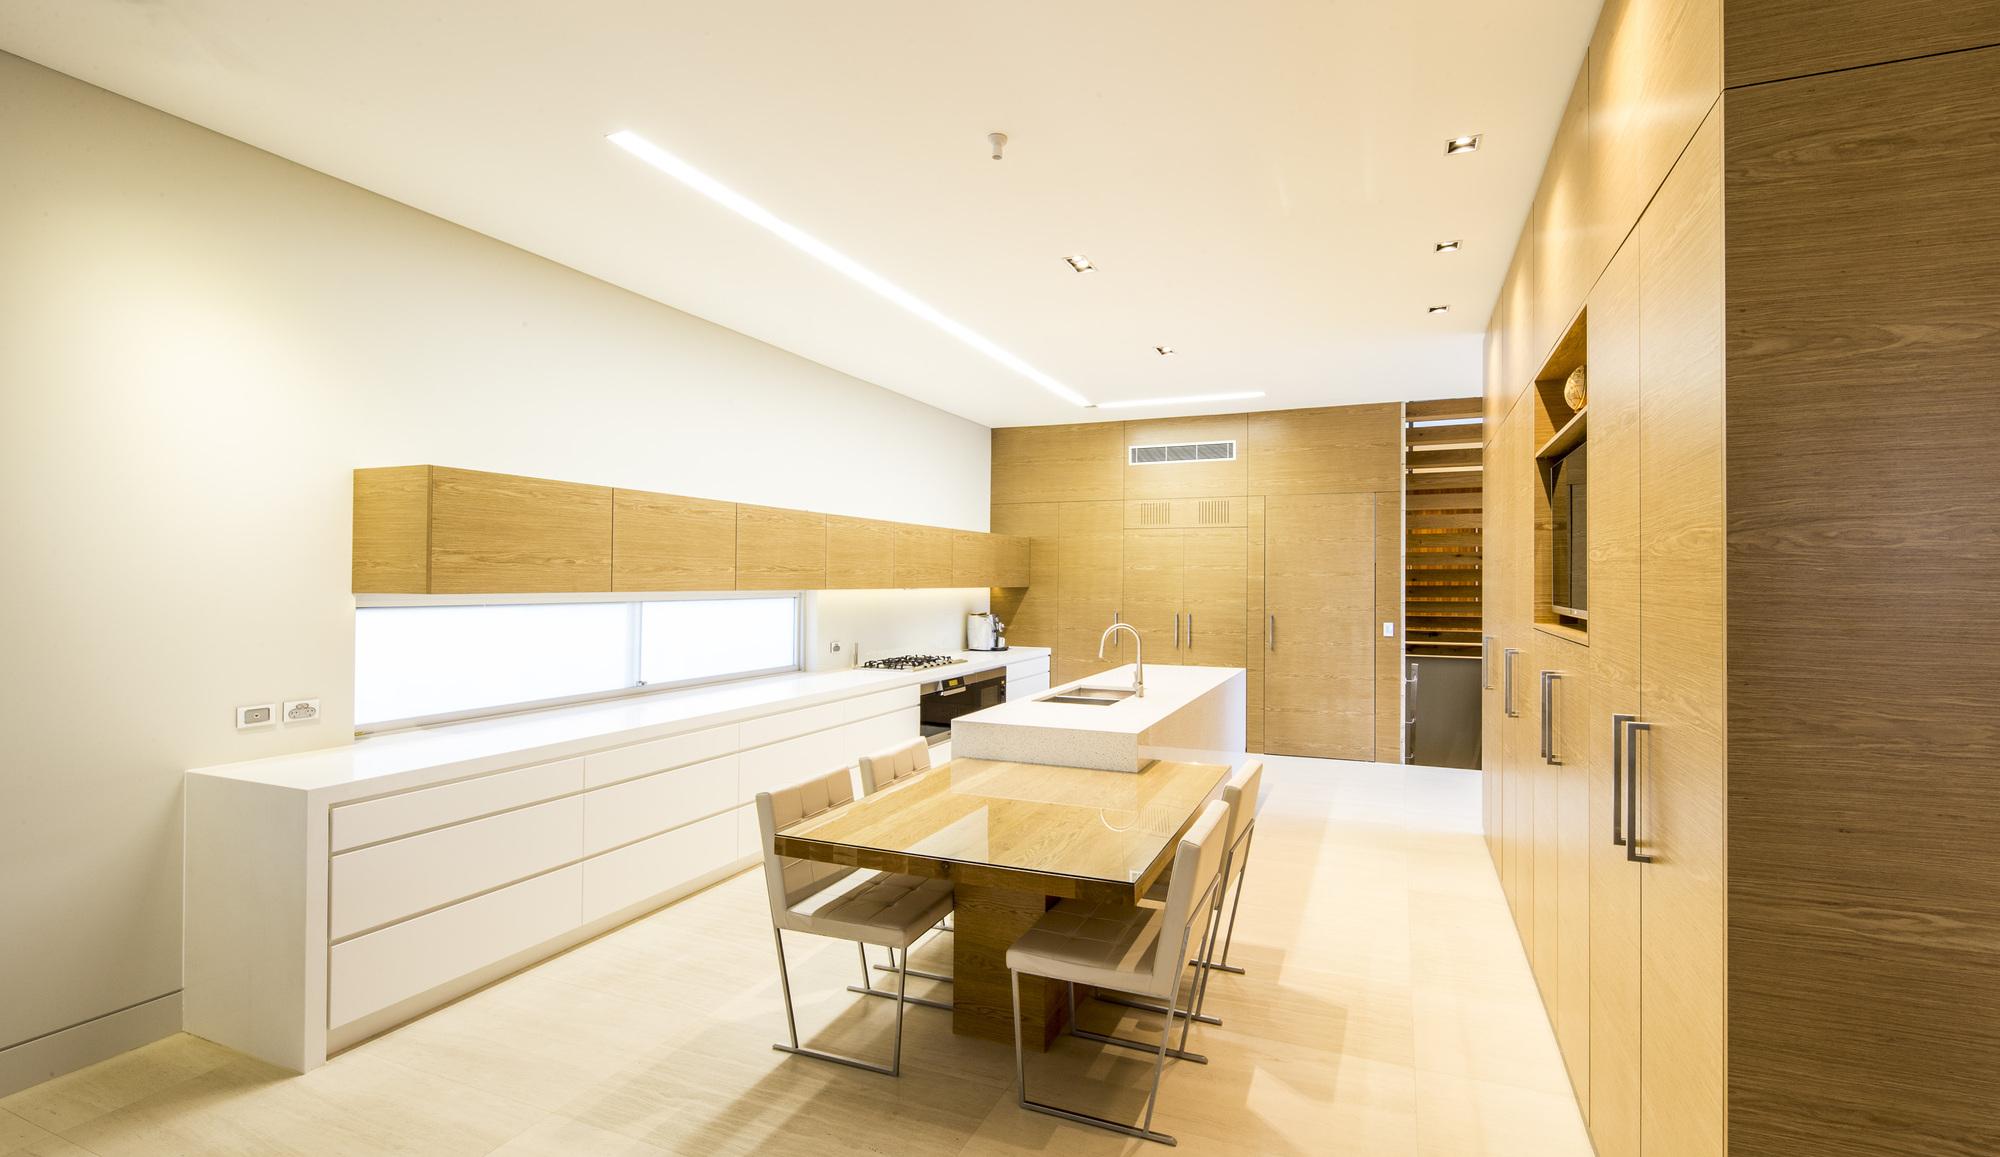 524b74ece8e44eff020003cd_box-house-zouk-architects_house040913_008.jpg